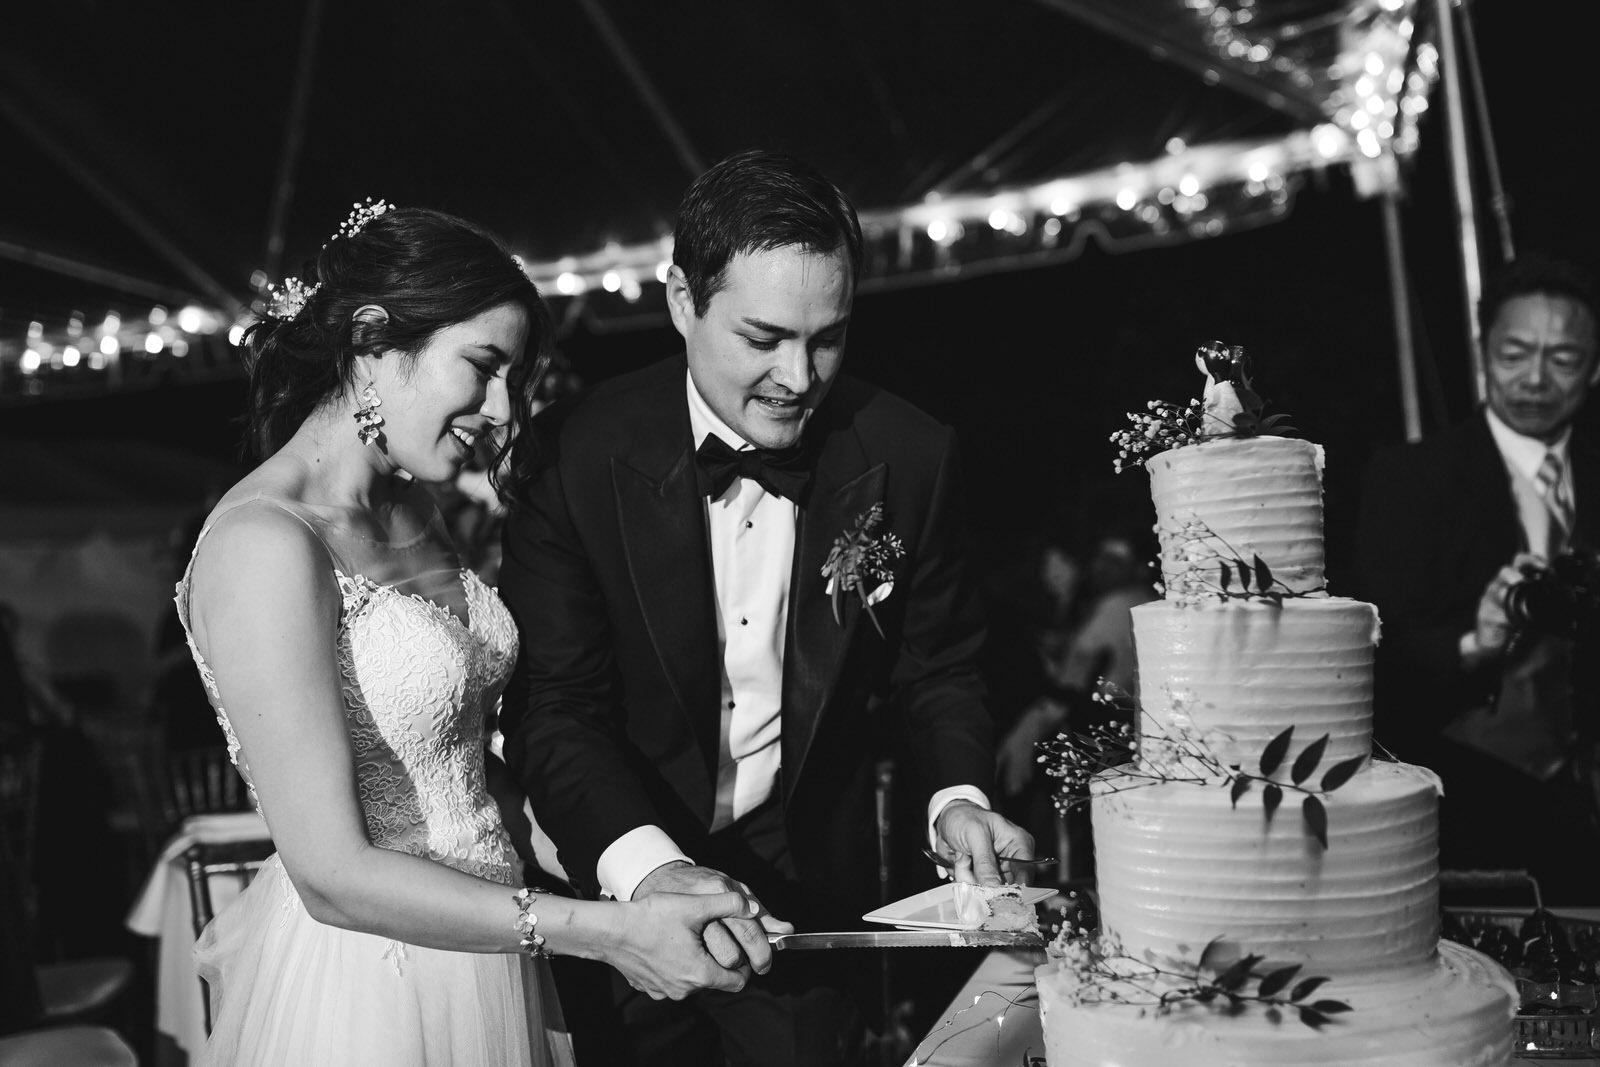 bride_groom_cutting_cake_tiny_house_photo_luxury_wedding_photographer.jpg